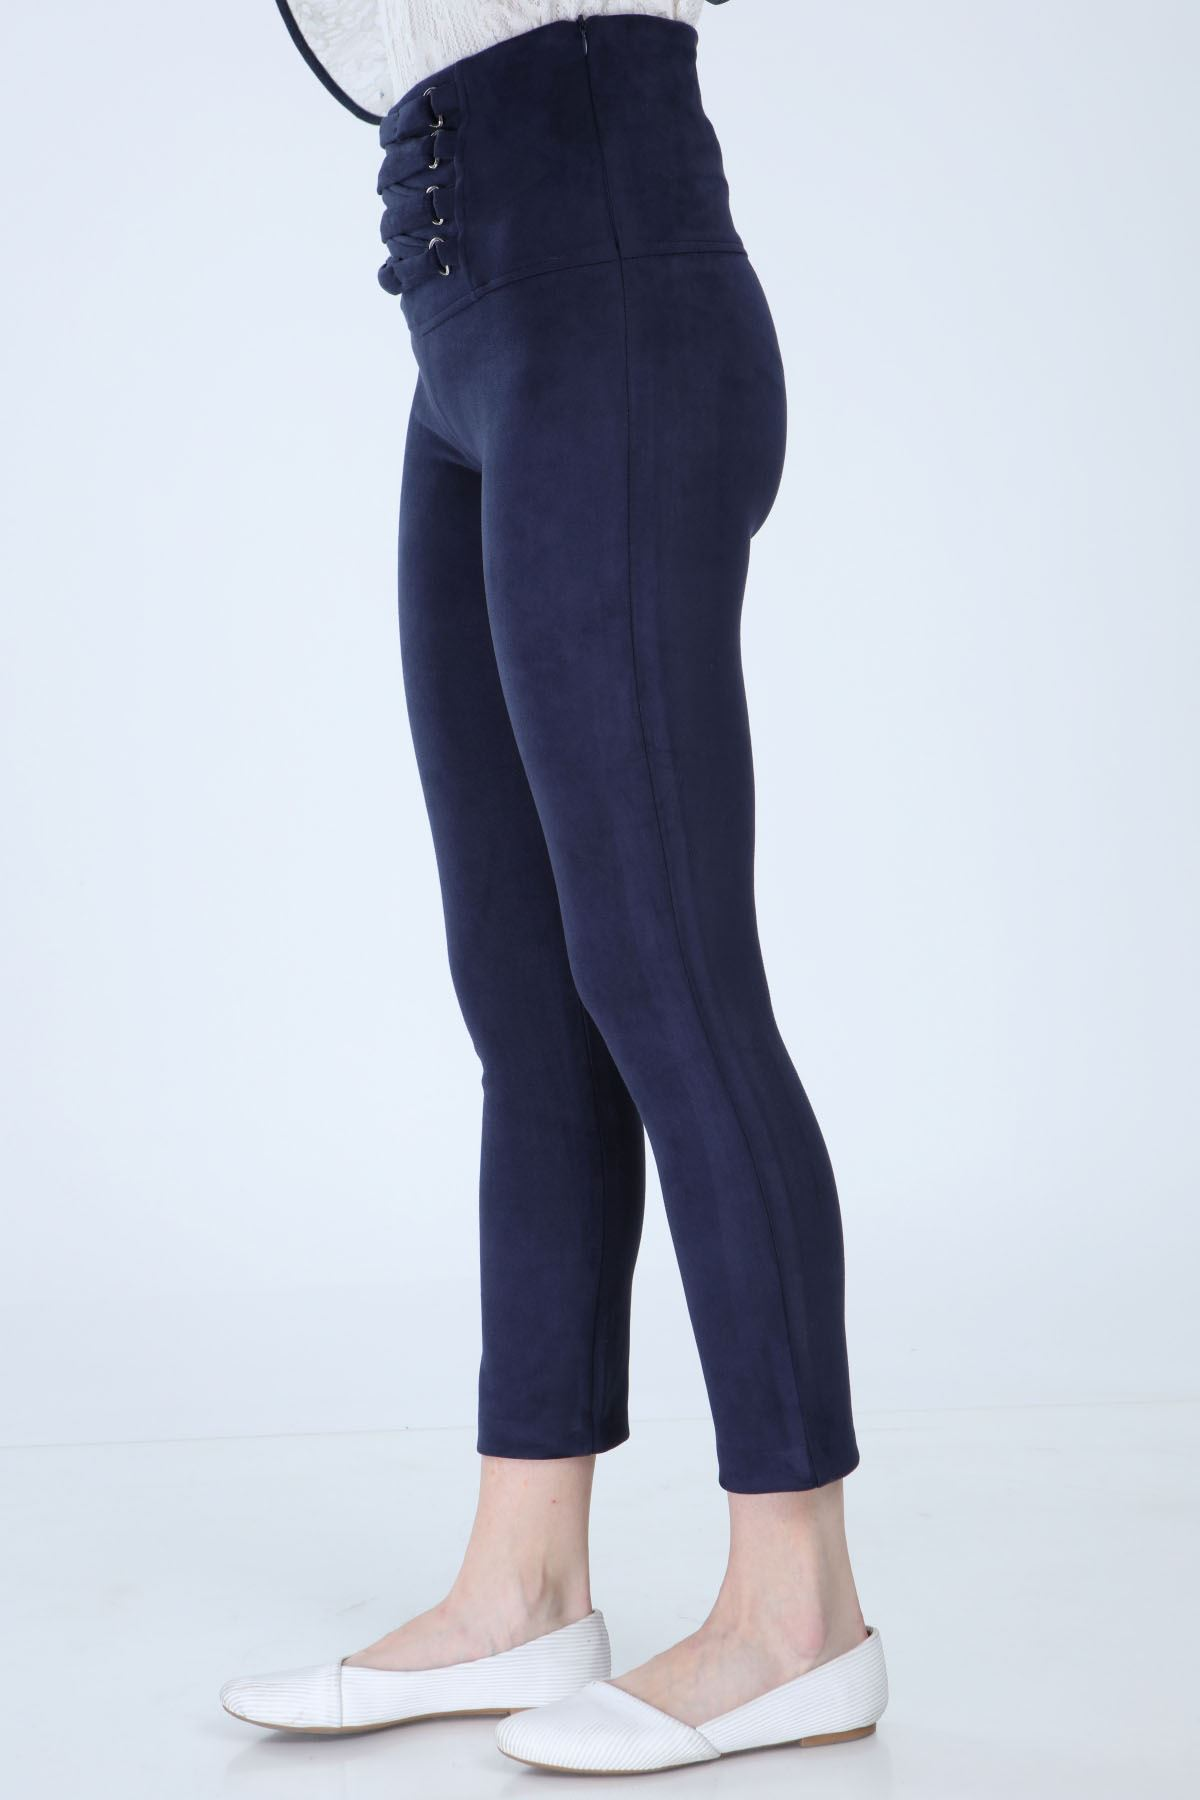 Lacivert Likralı Süet Pantolon 3C-1001